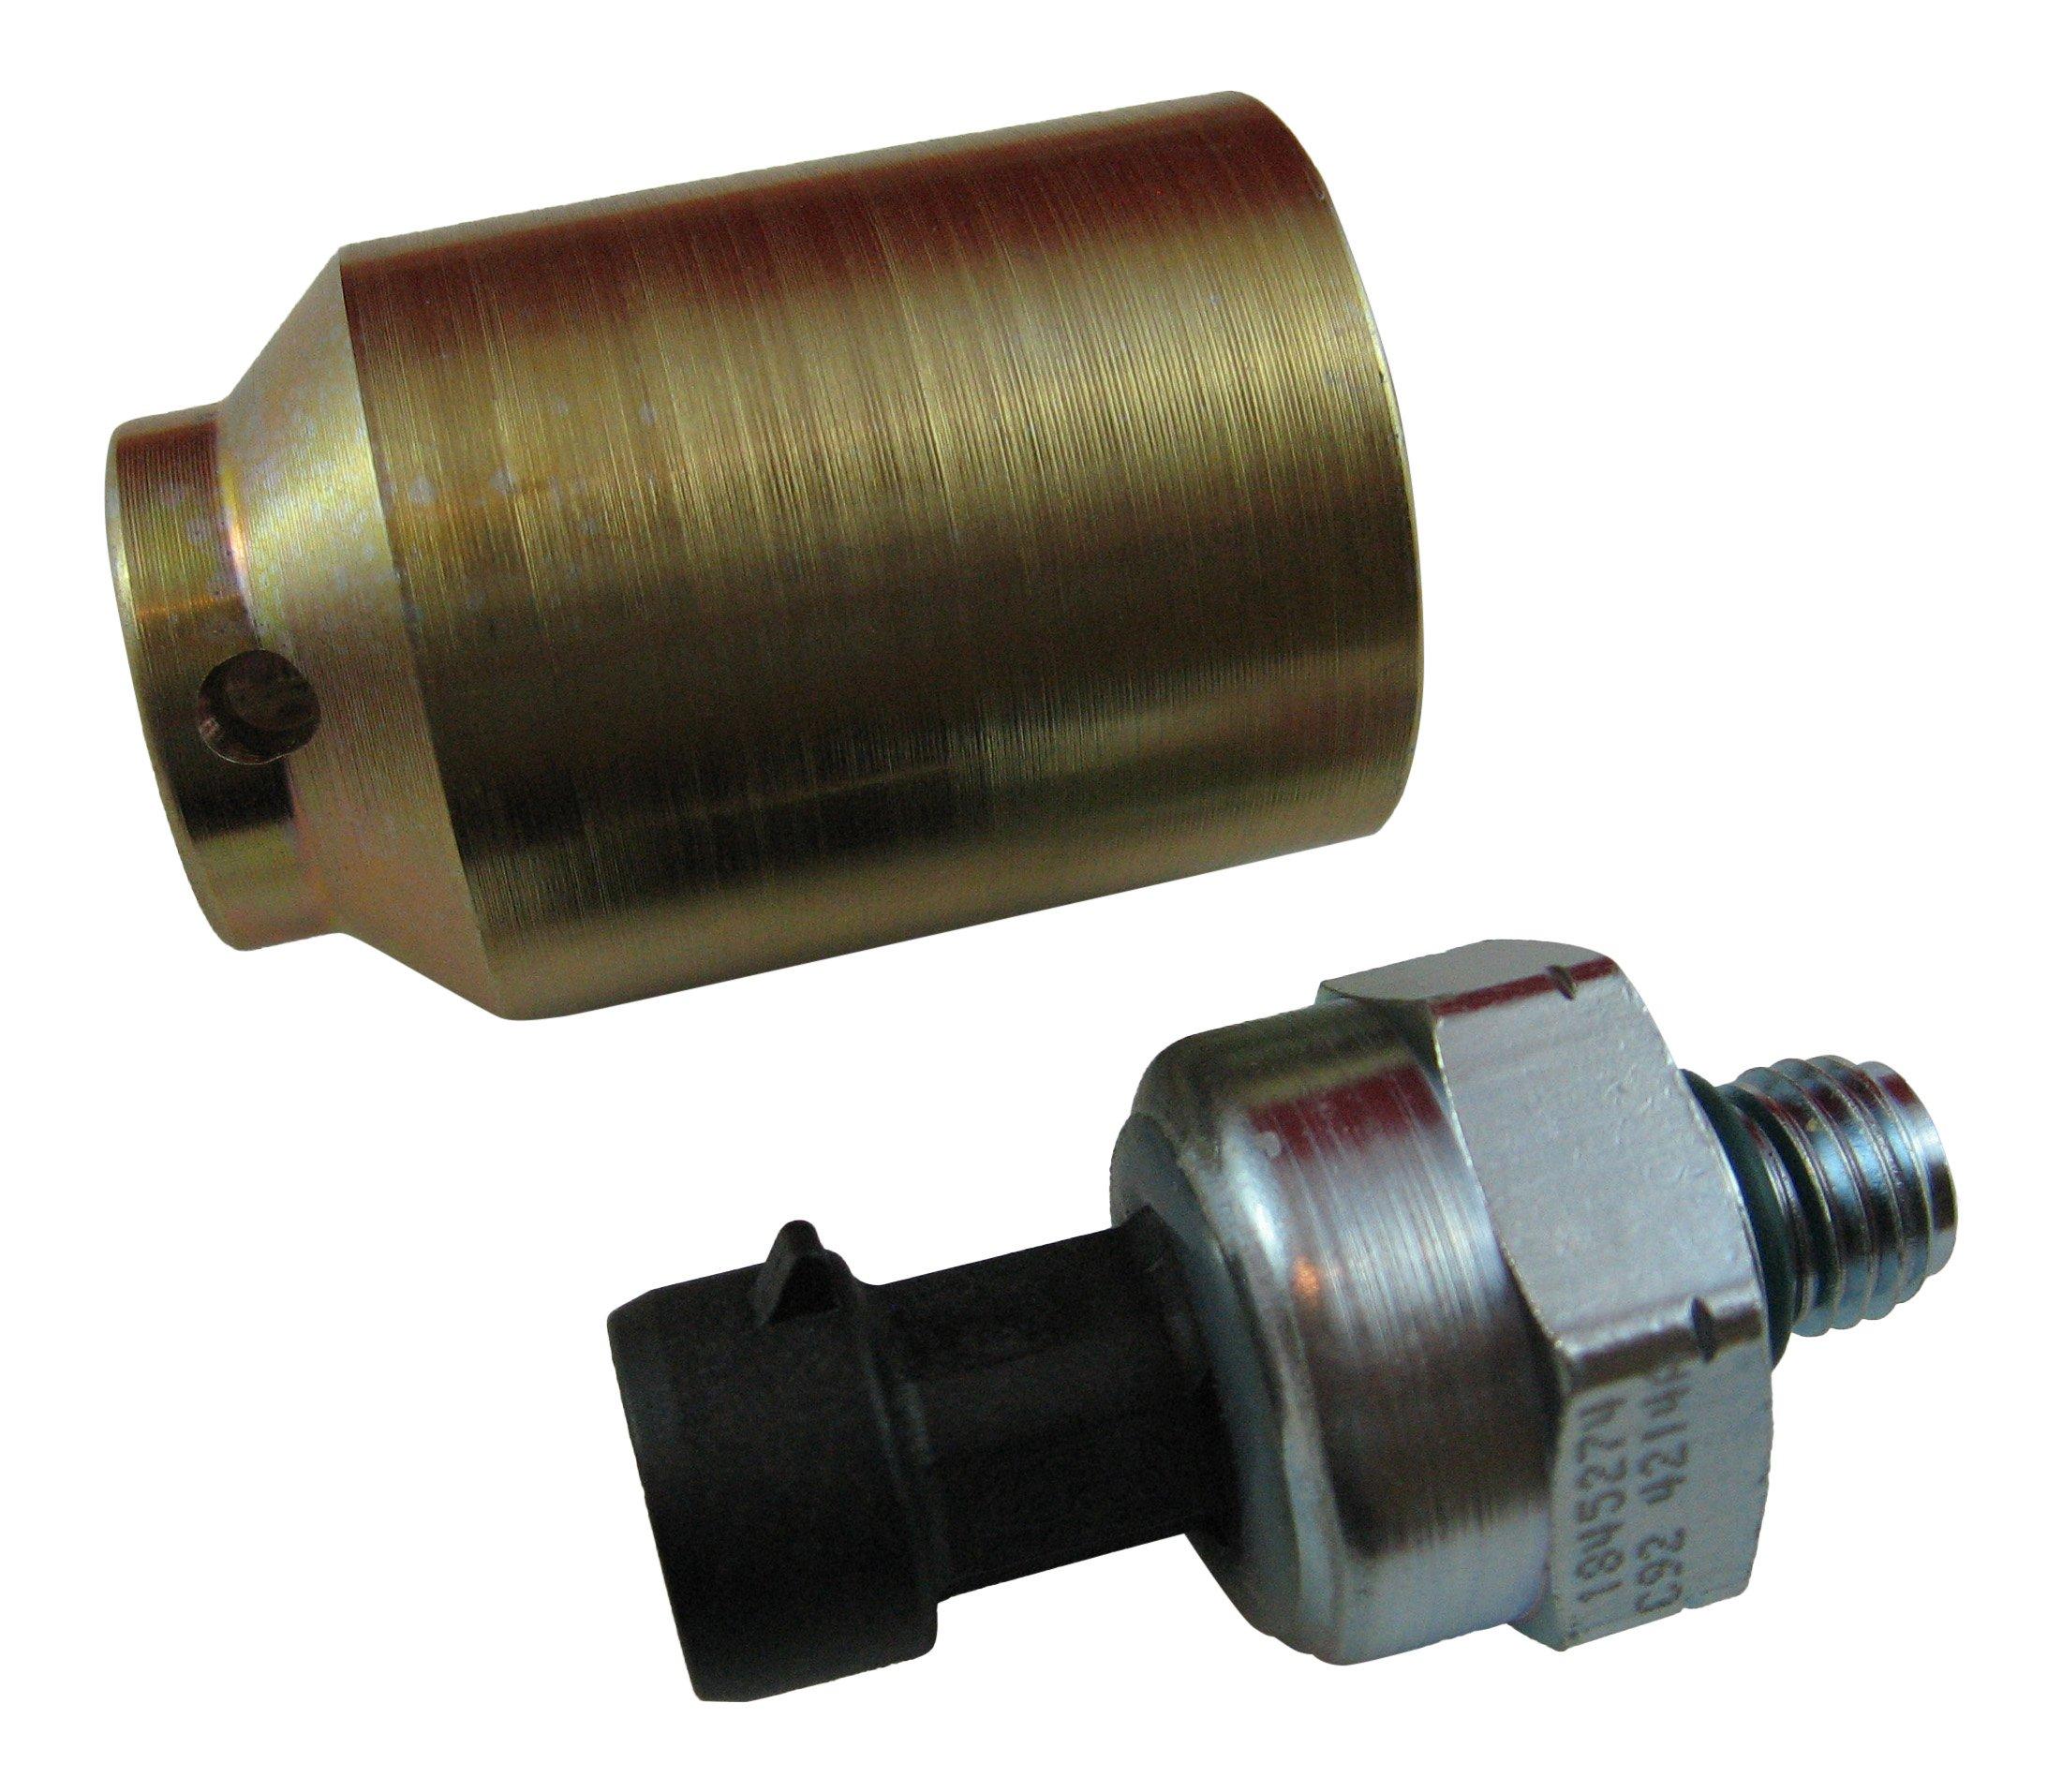 AccurateDiesel 6.0L / 7.3L Powerstroke ICP / Oil Pressure Sensor Socket (Life-saver on 03 6.0L) by AccurateDiesel (Image #2)